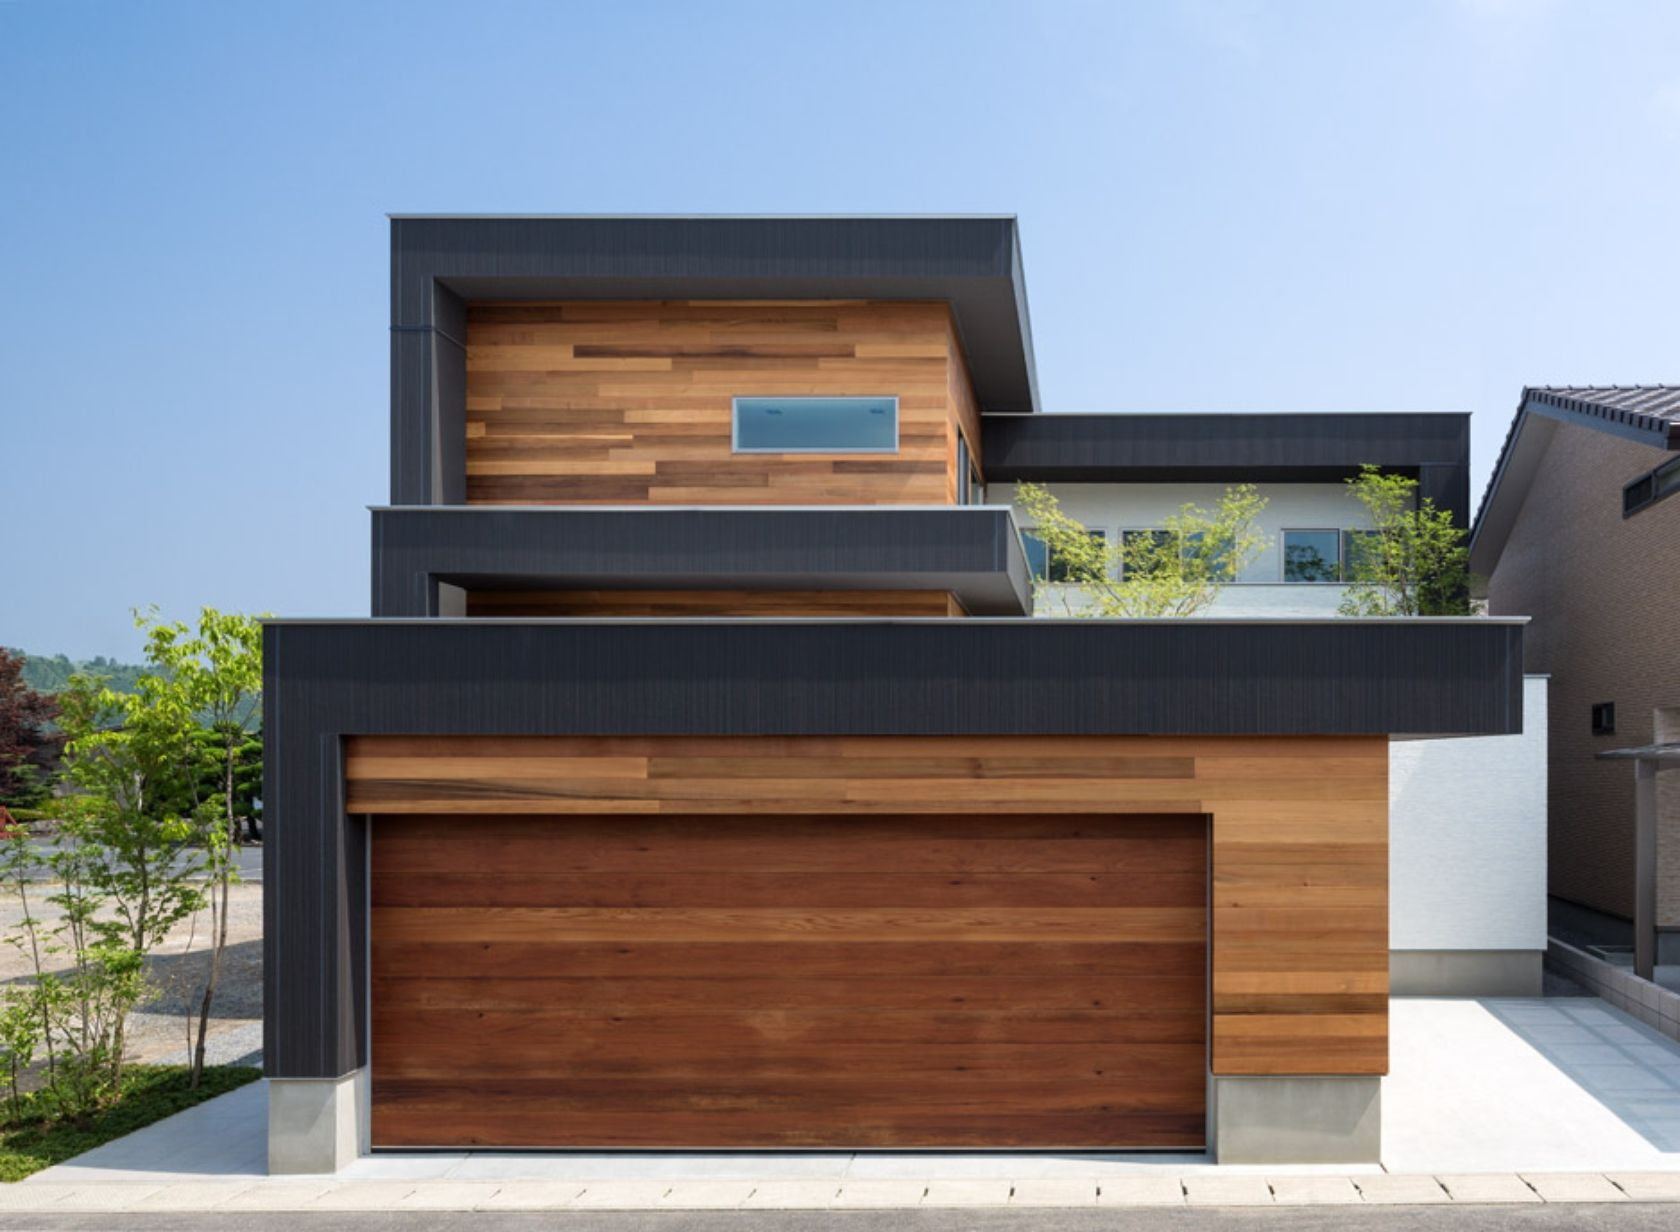 M4 house sasebo nagasaki japan architecture pinterest